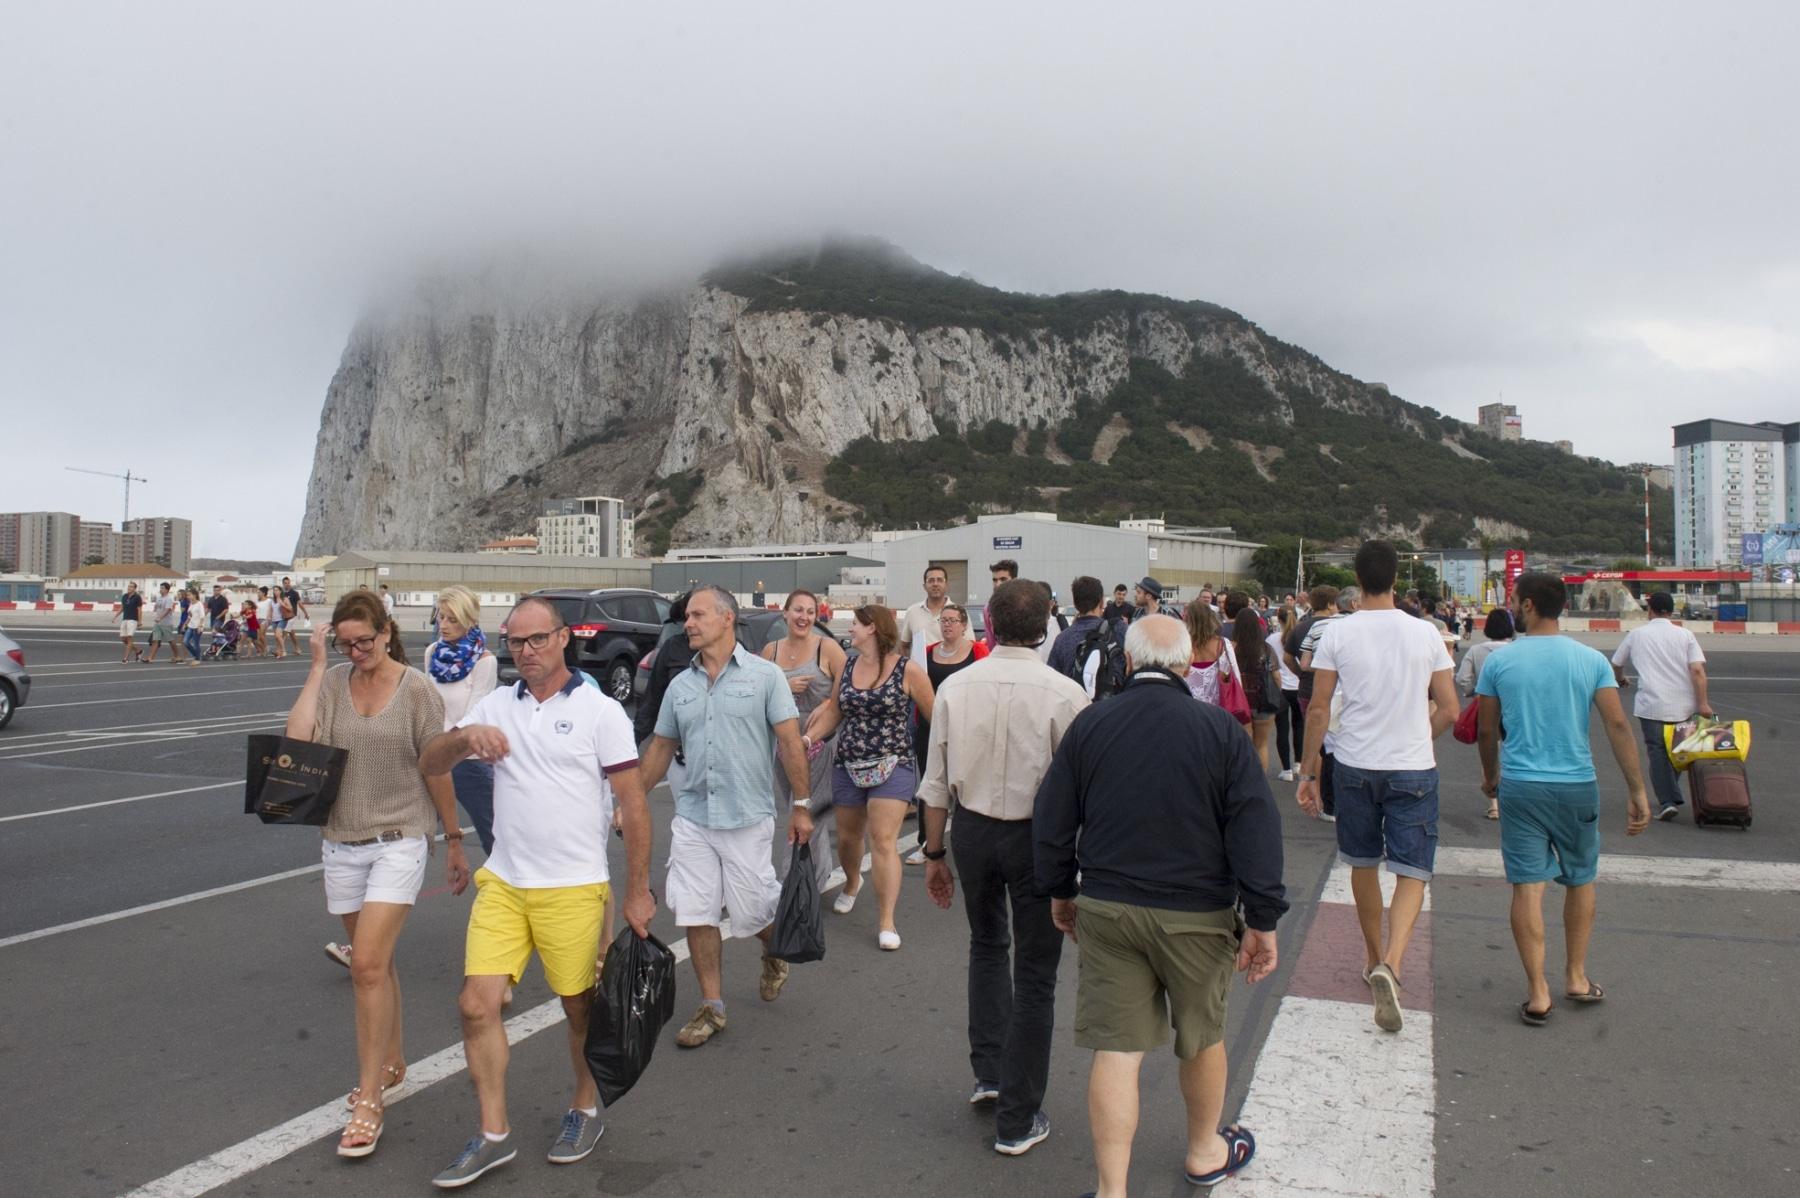 concierto-evacuados-de-gibraltar-07092015-1bn_20617801463_o